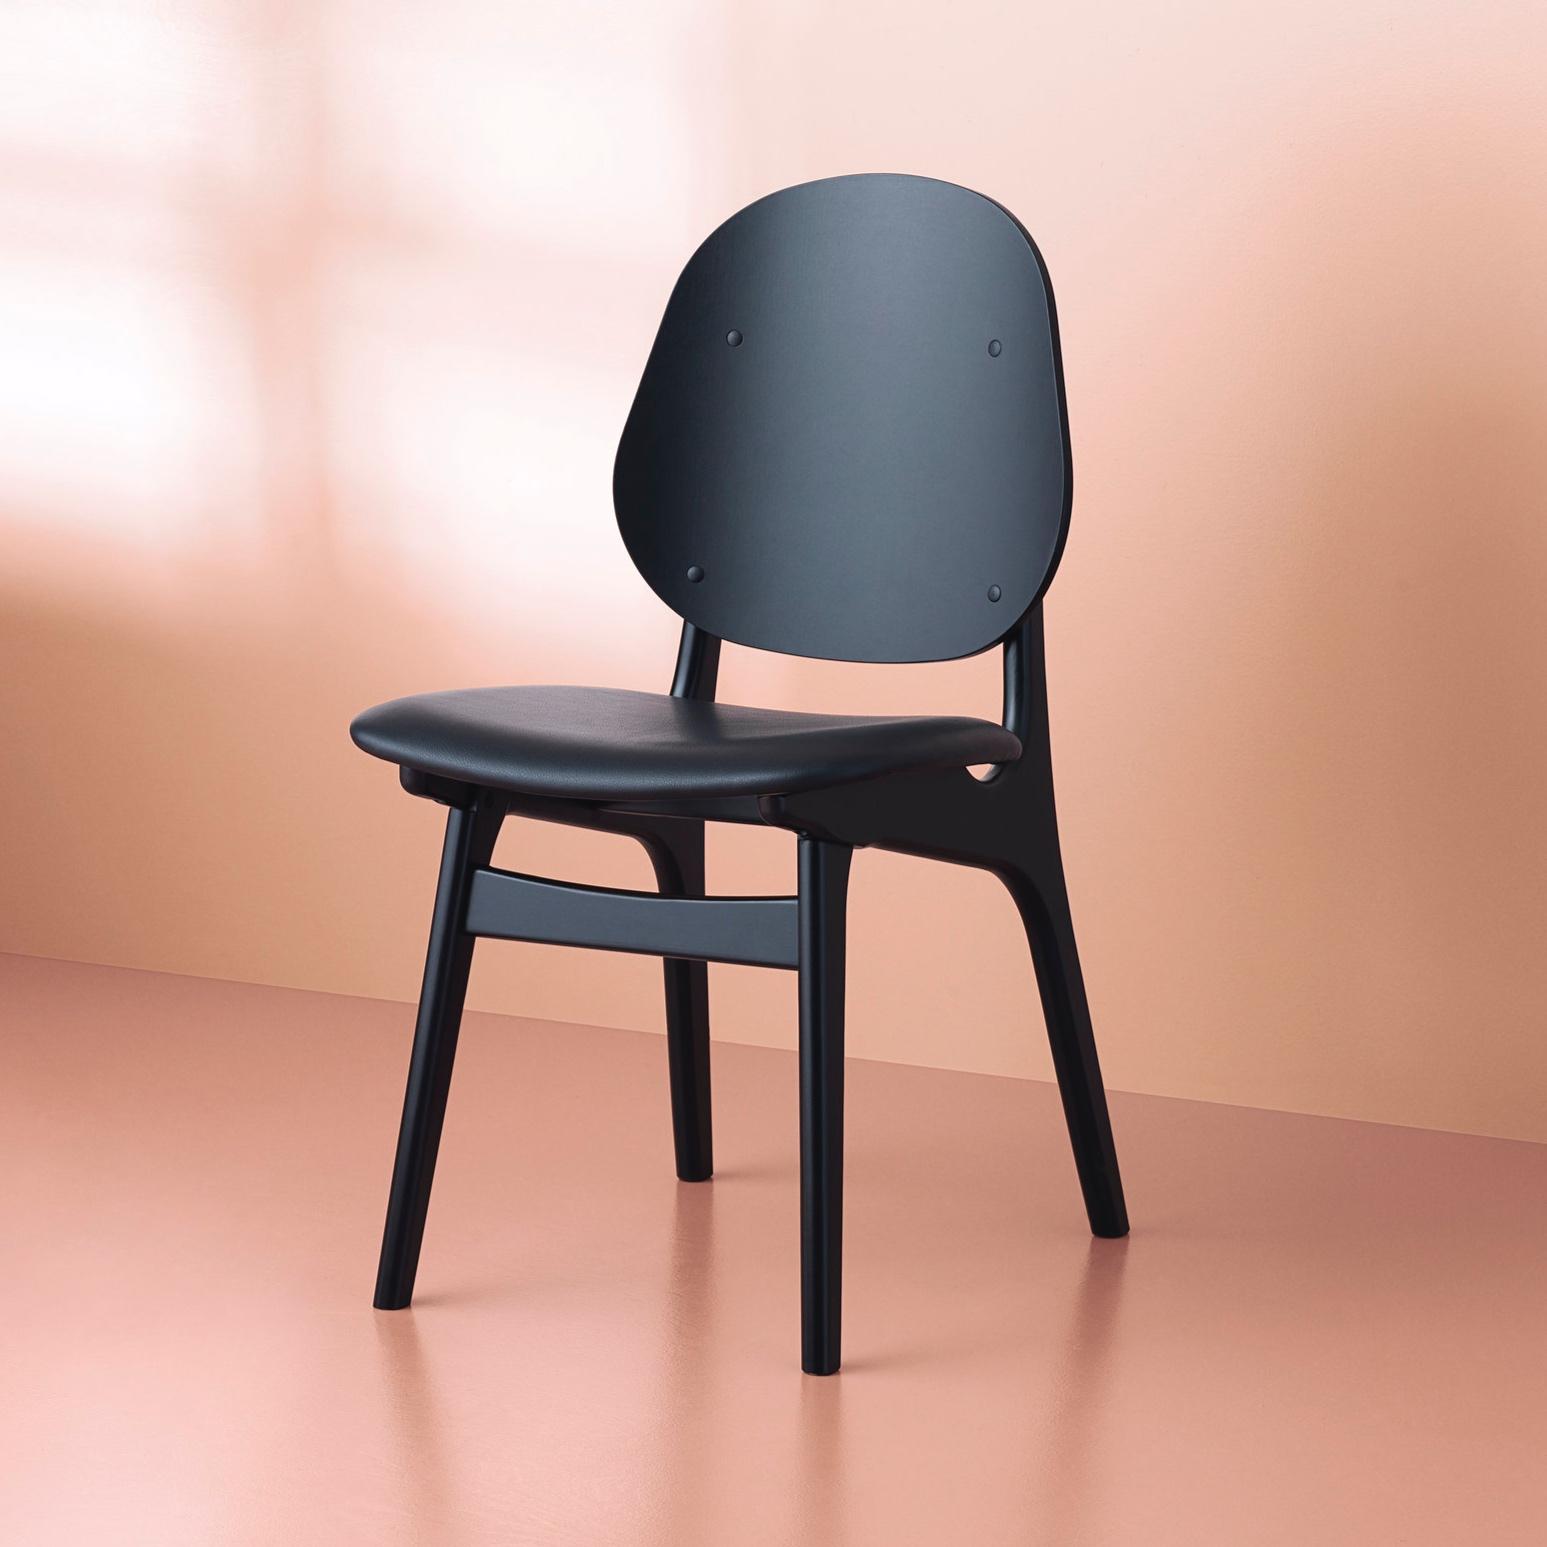 gestalt-new-york-warmnordic-furniture-noble-diningchair-blackstained-beech-seat-black-leather-prescott-vnude.jpg